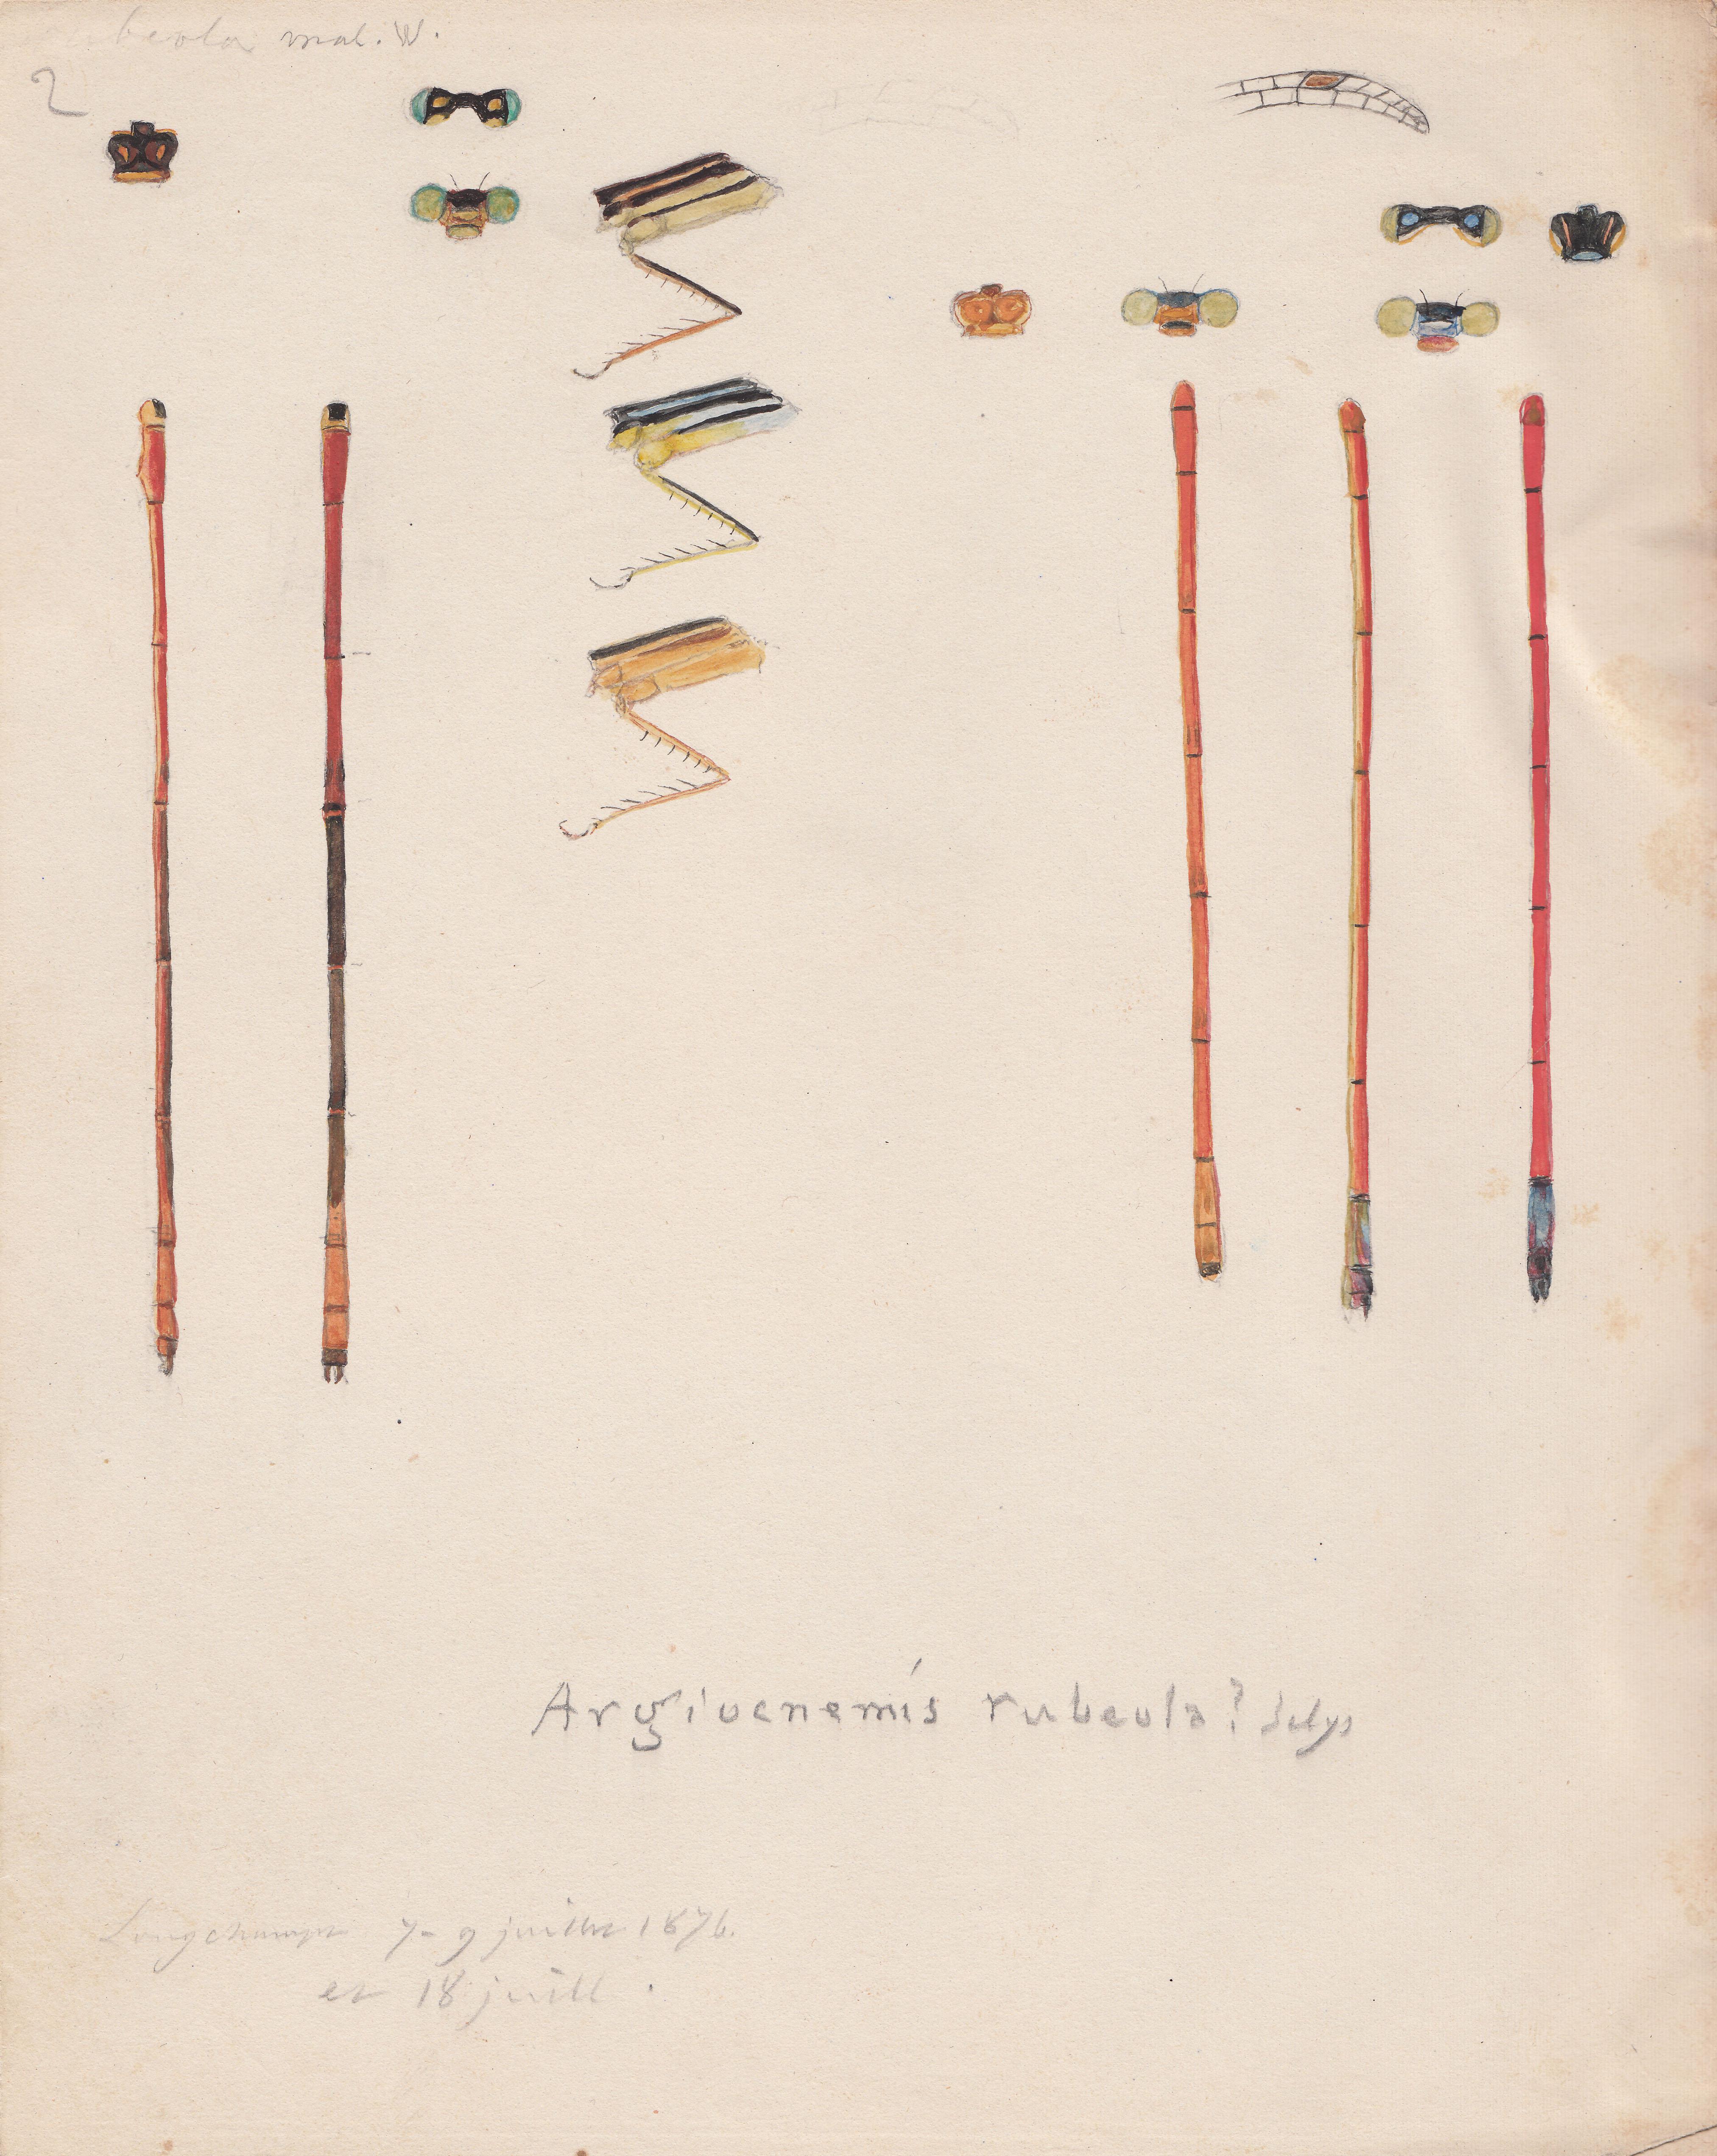 Argiocnemis rubeola.jpg